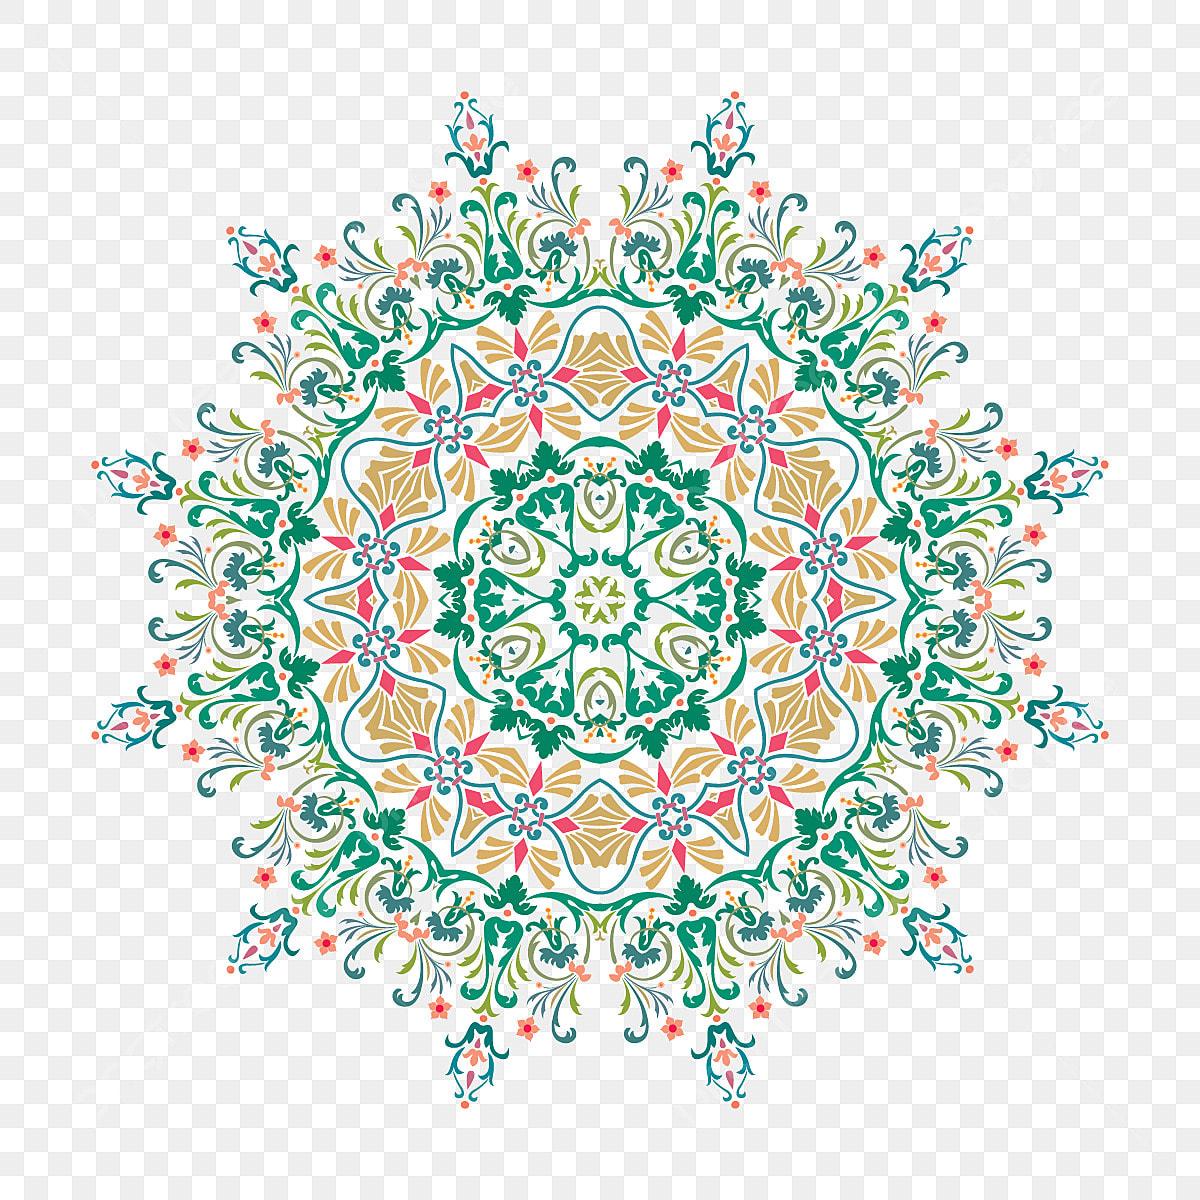 Mandala Oriental De Flor Para Colorir Vetor De Mandala Floral